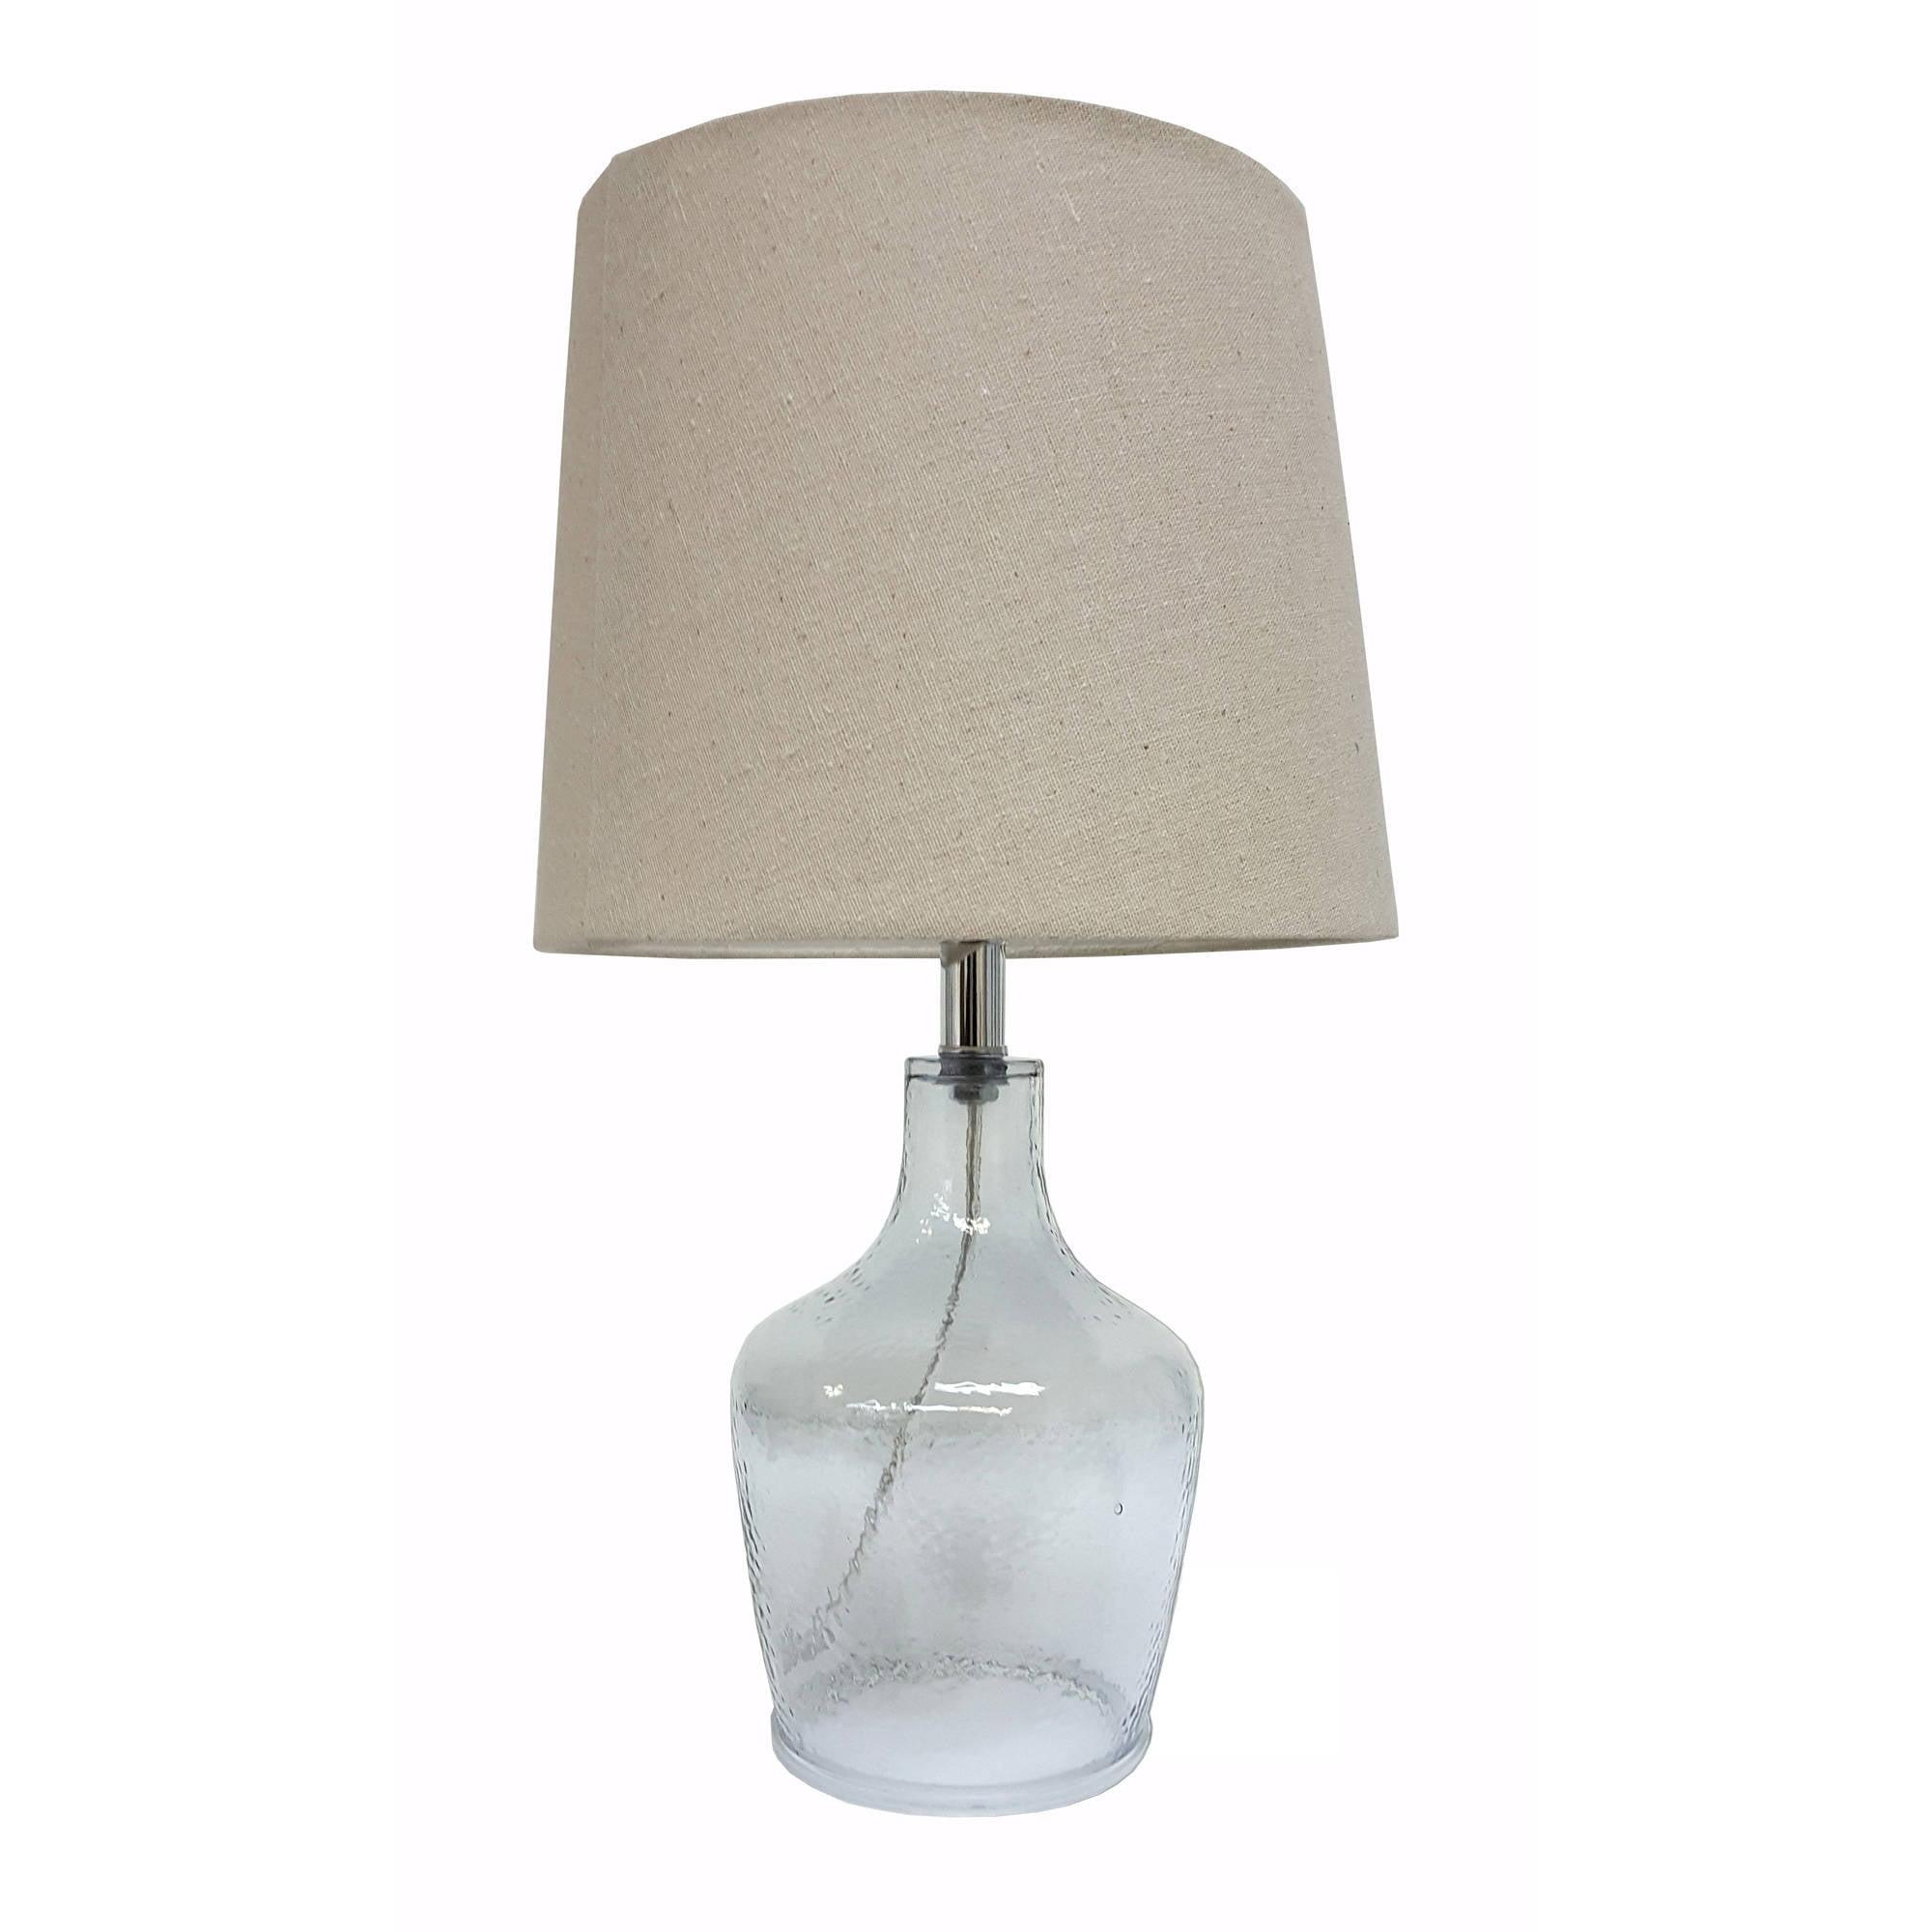 Perfect Urban Shop Artisan Glass Jug Lamp Base, Grey - Walmart.com BL71